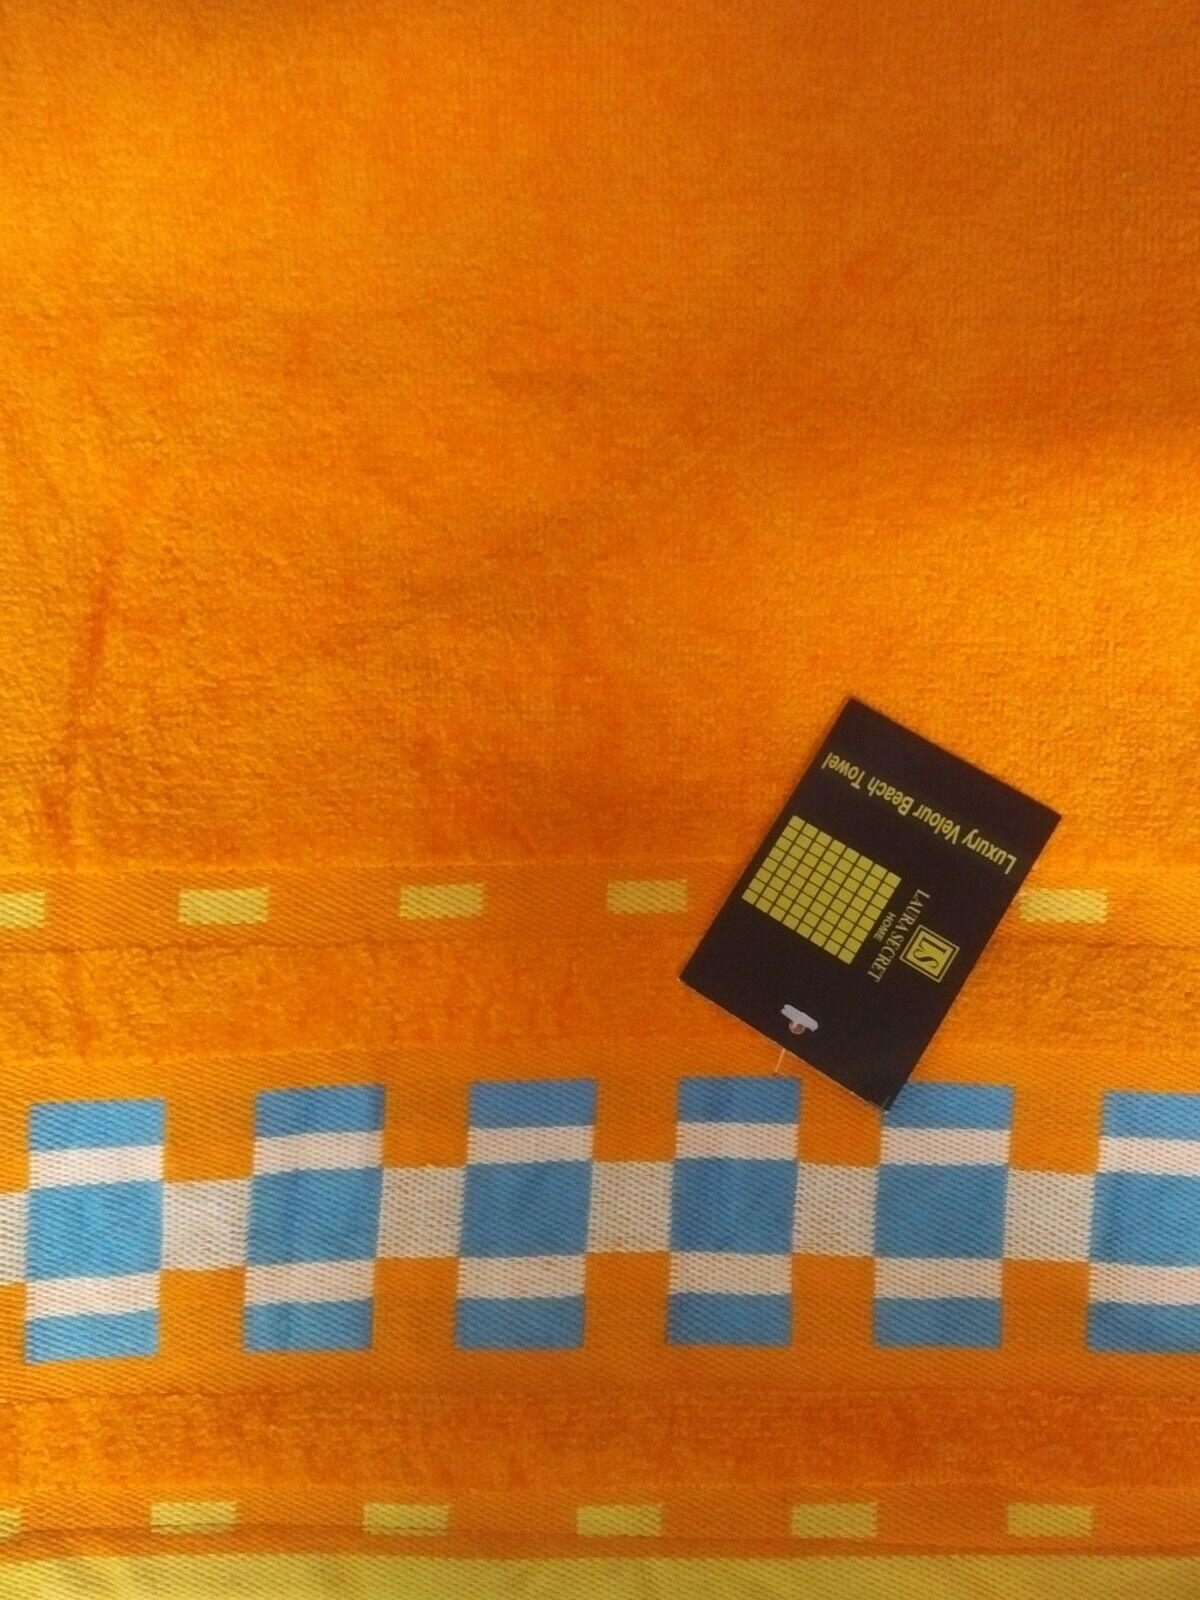 1 x Multi-Purpose 100% Cotton Towel (Beach/Gym/ Pet) 150x75cm approx- Orange